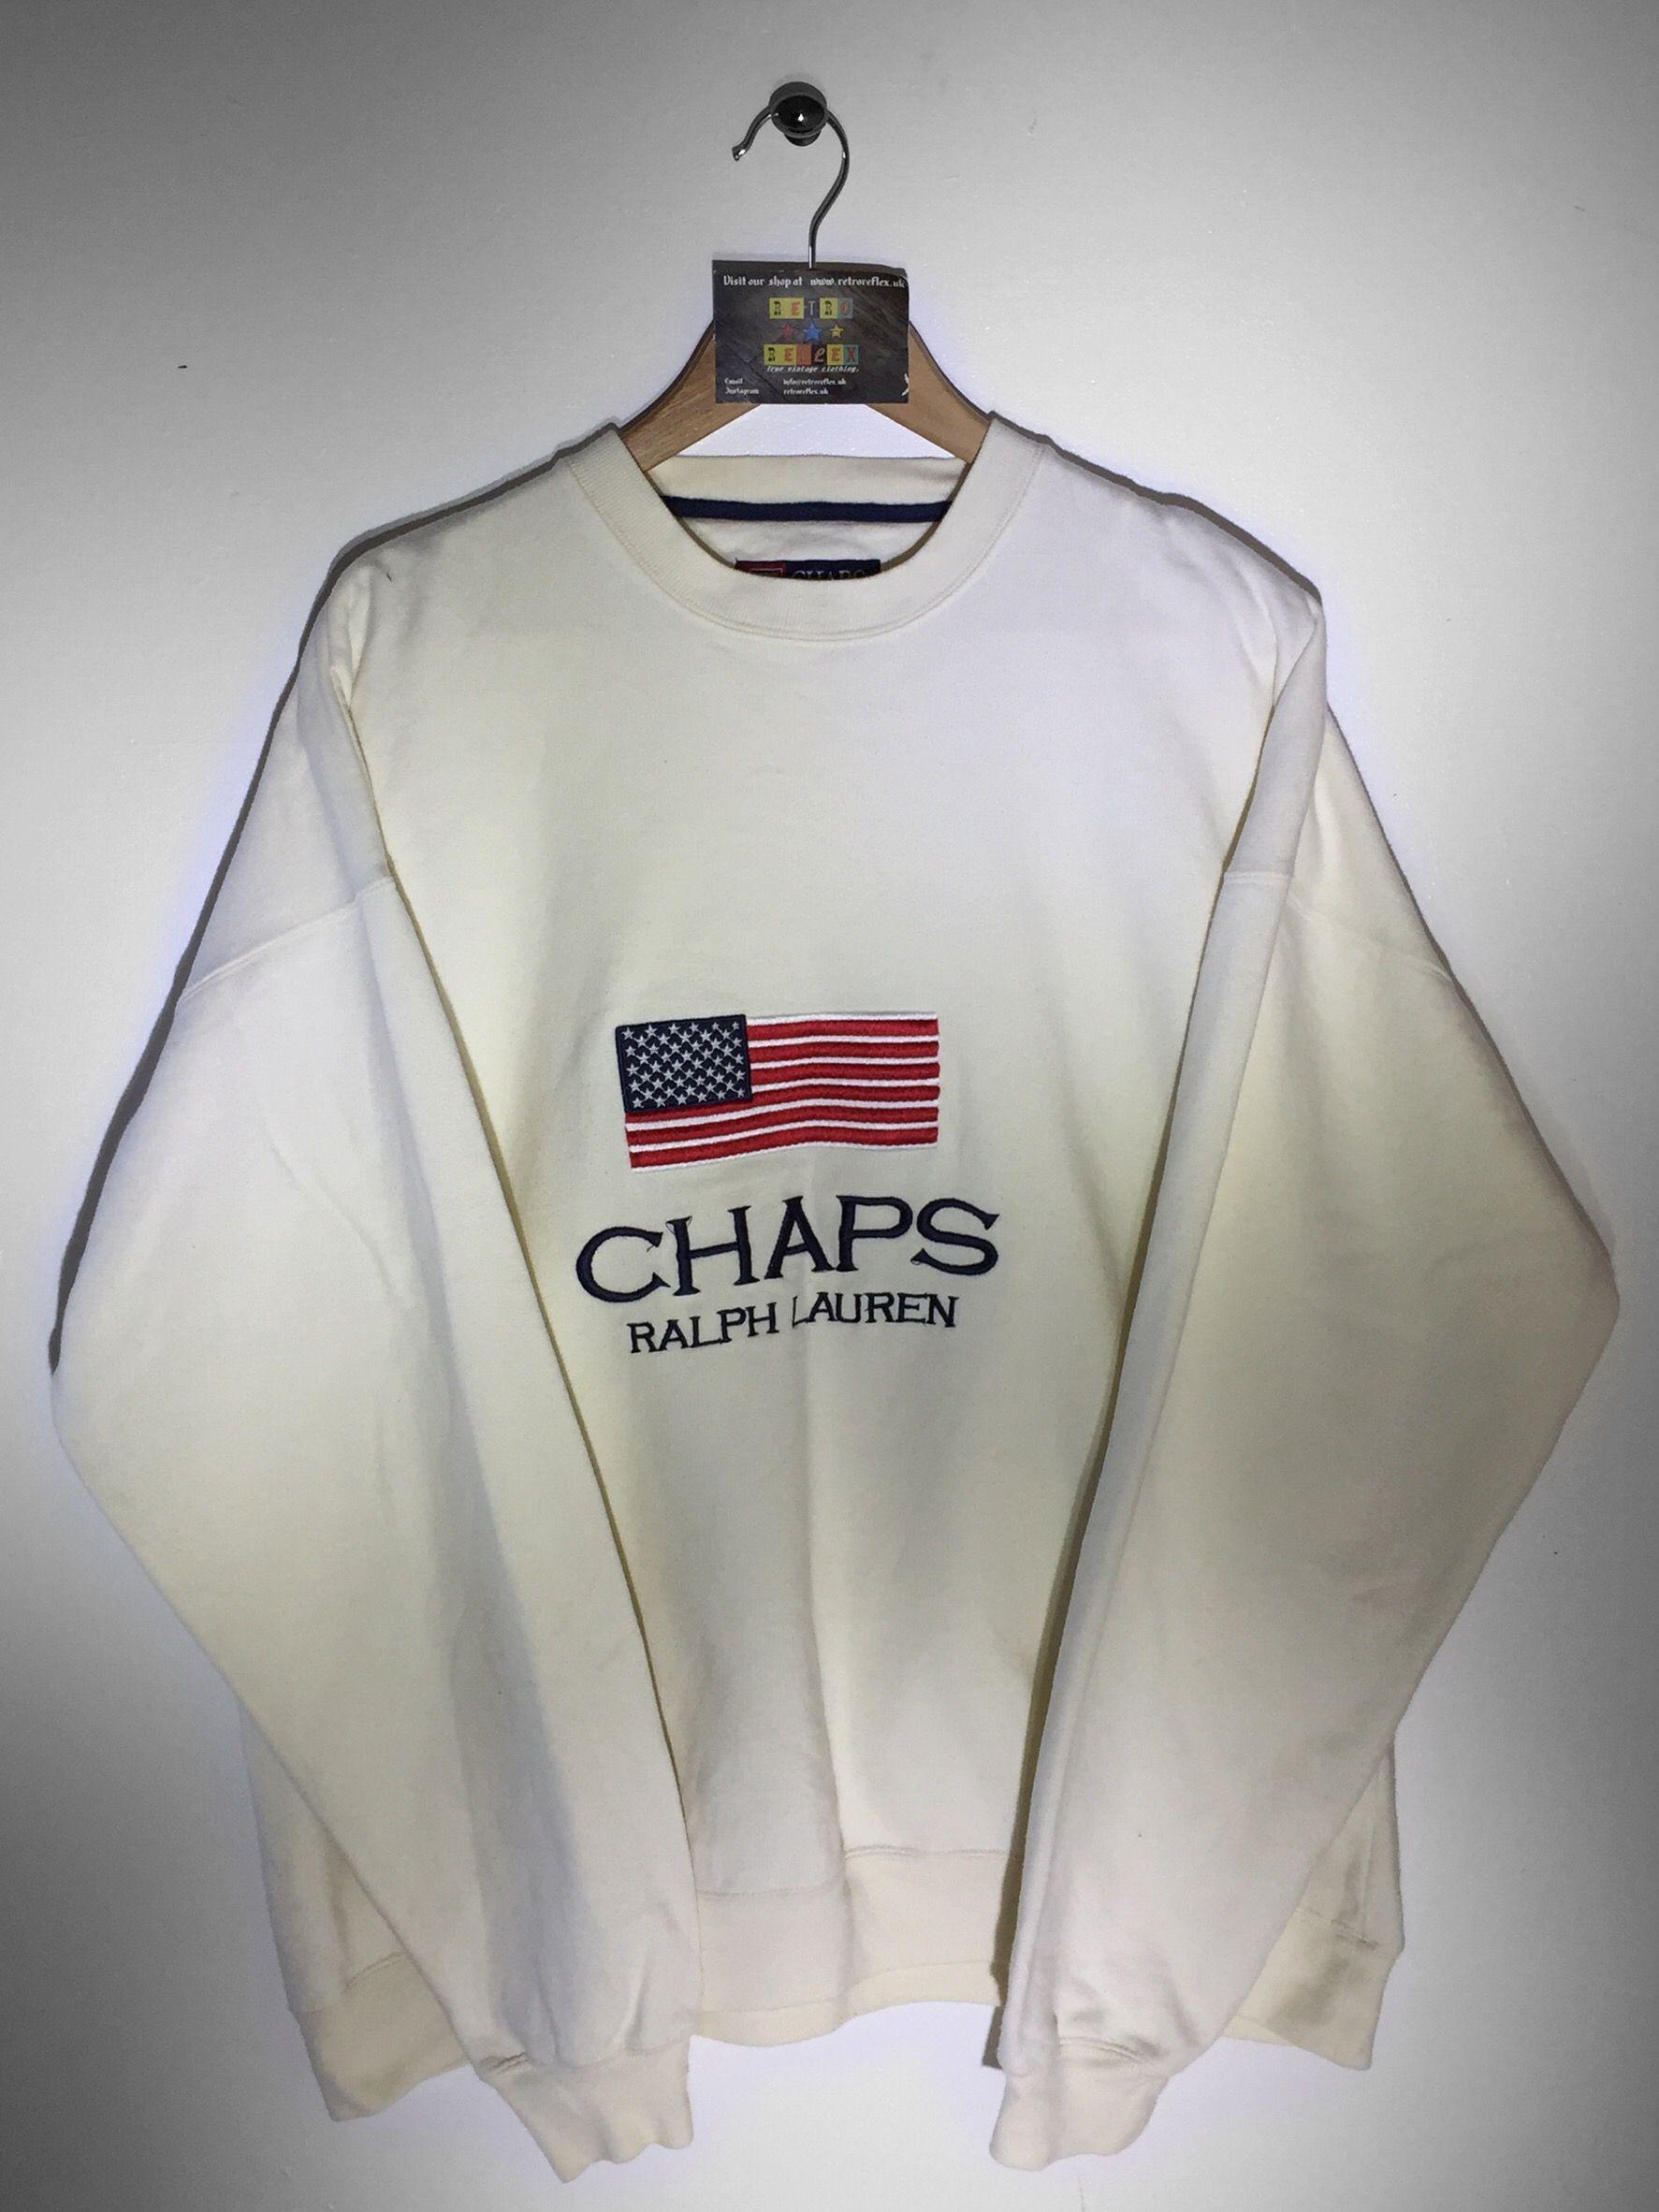 fd36eaeb8d7 Ralph Lauren Chaps sweatshirt size X Large(but Fits Oversized) £60 Website➡  www.retroreflex.uk